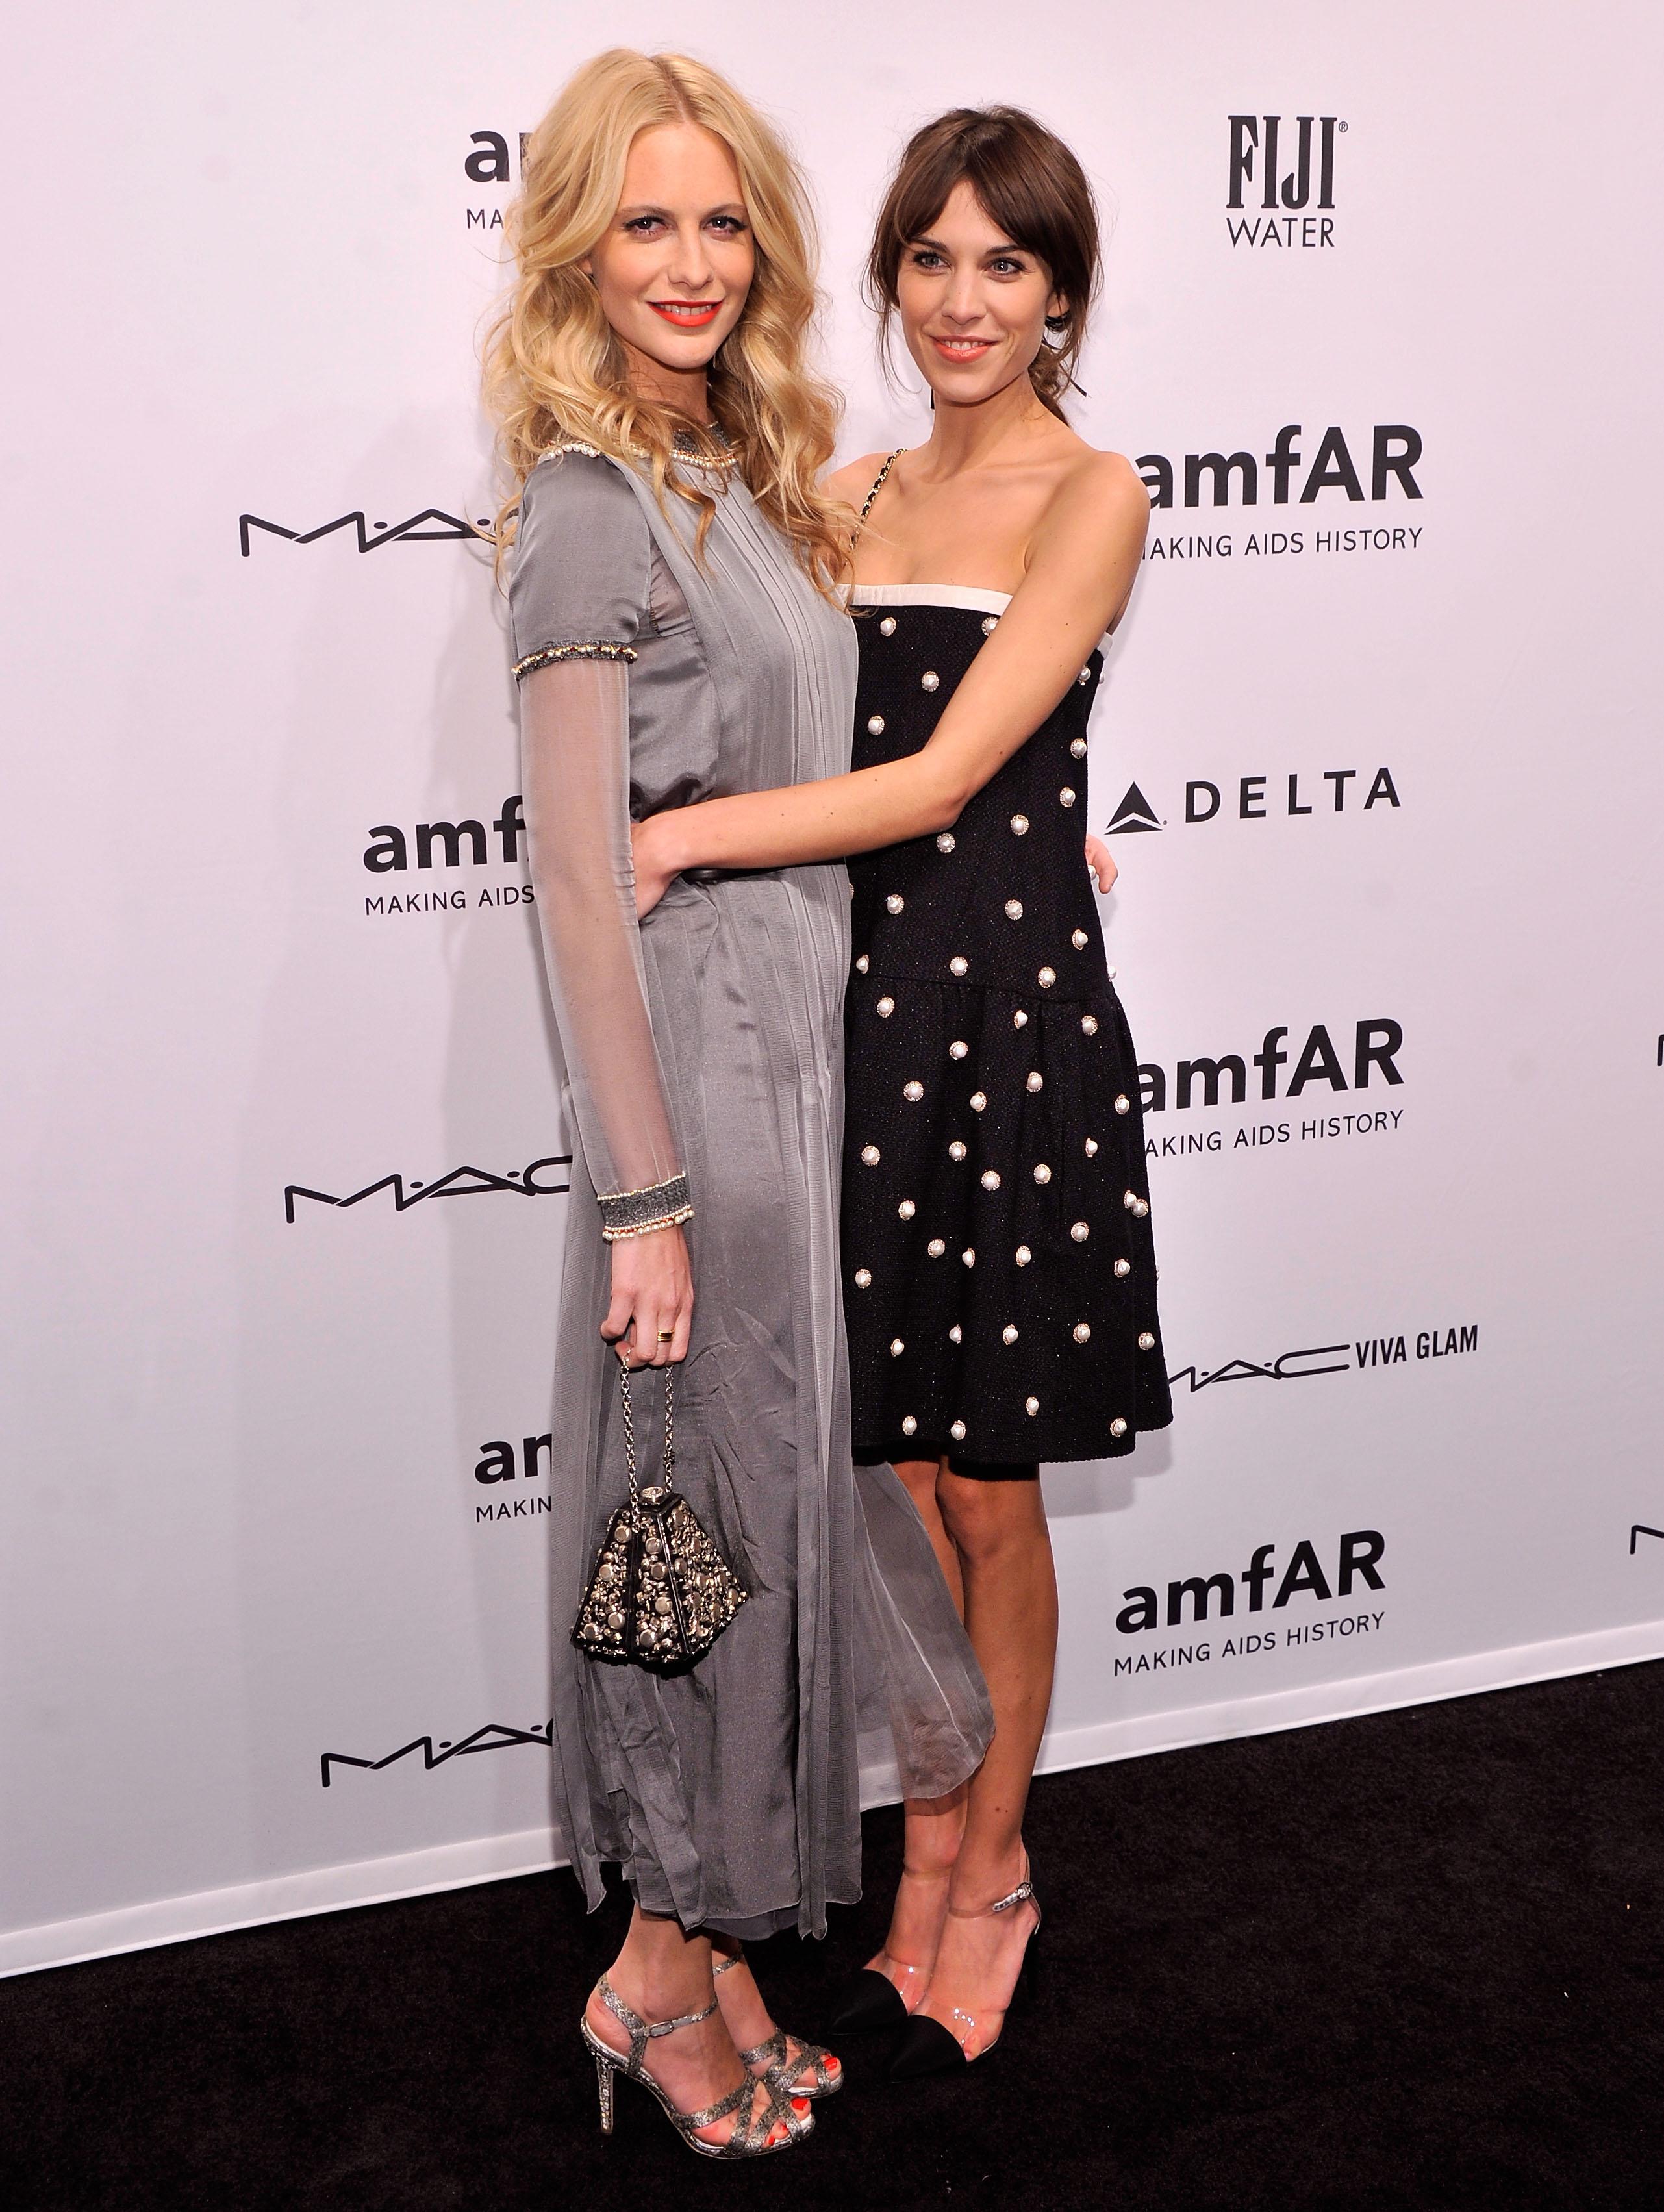 Alexa Chung hugged friend Poppy Delevingne at the amfAR New York Gala on Wednesday.